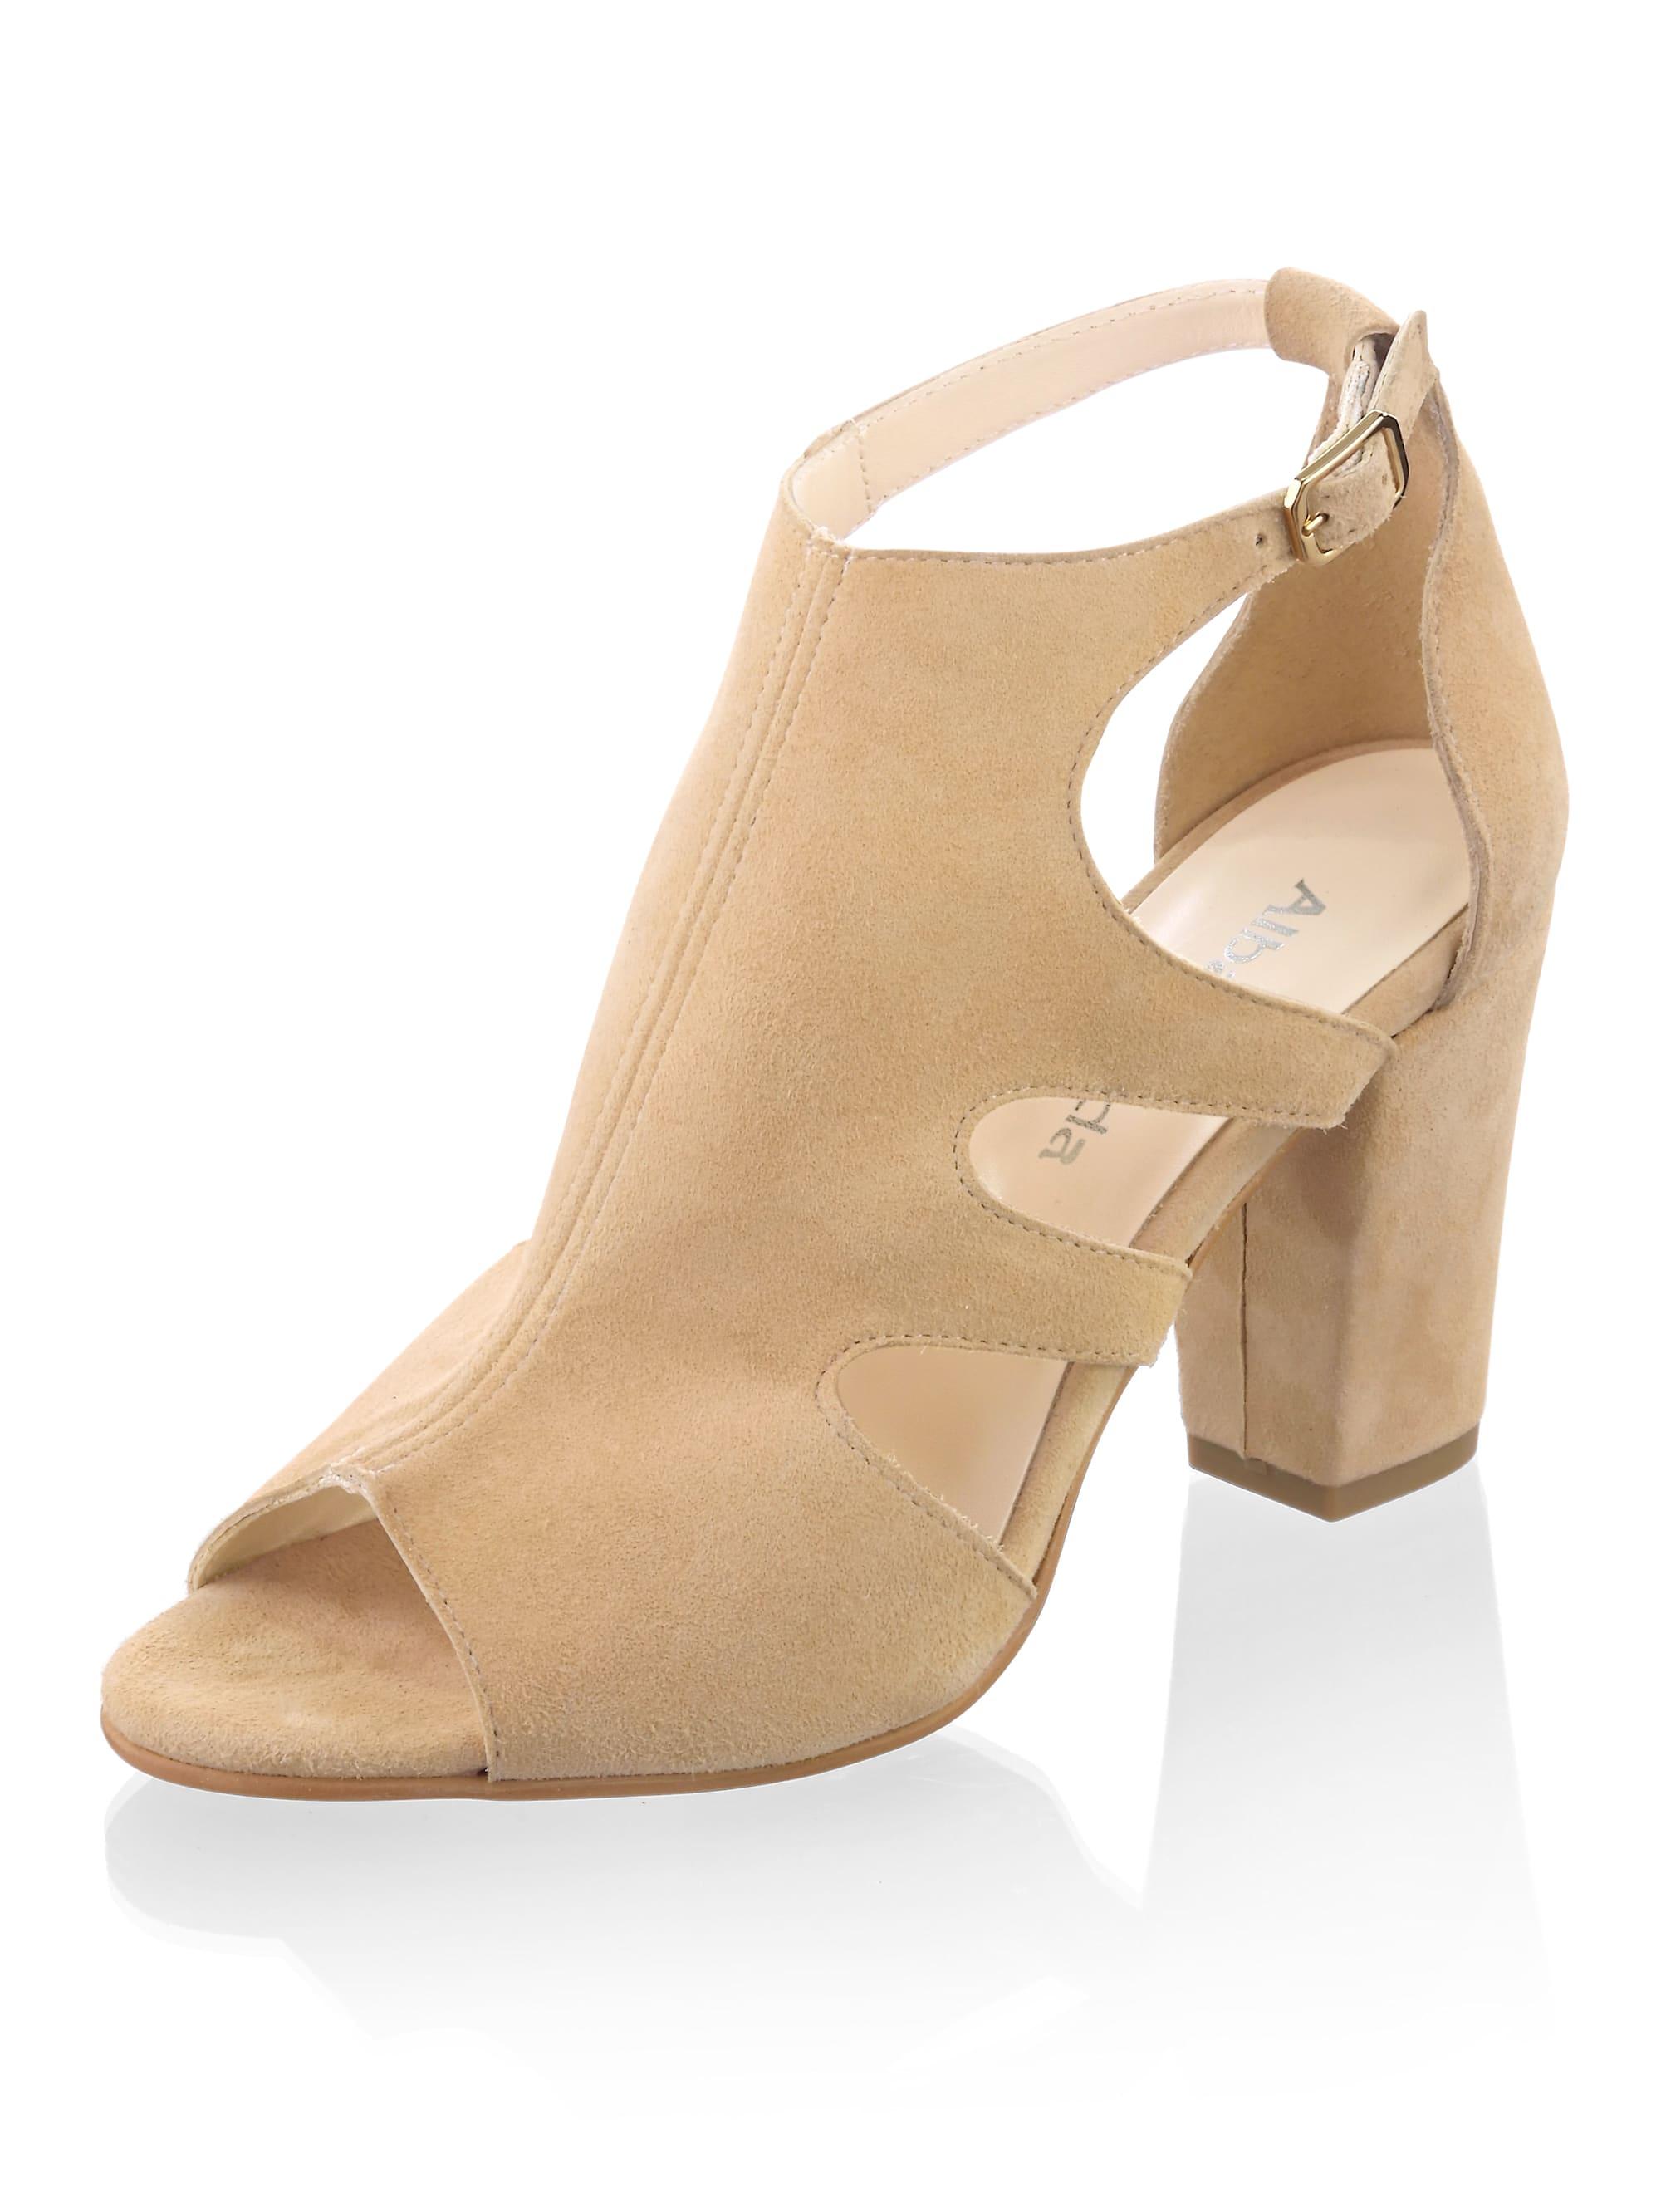 alba moda -  Sandalette mit seitlichen Cutouts